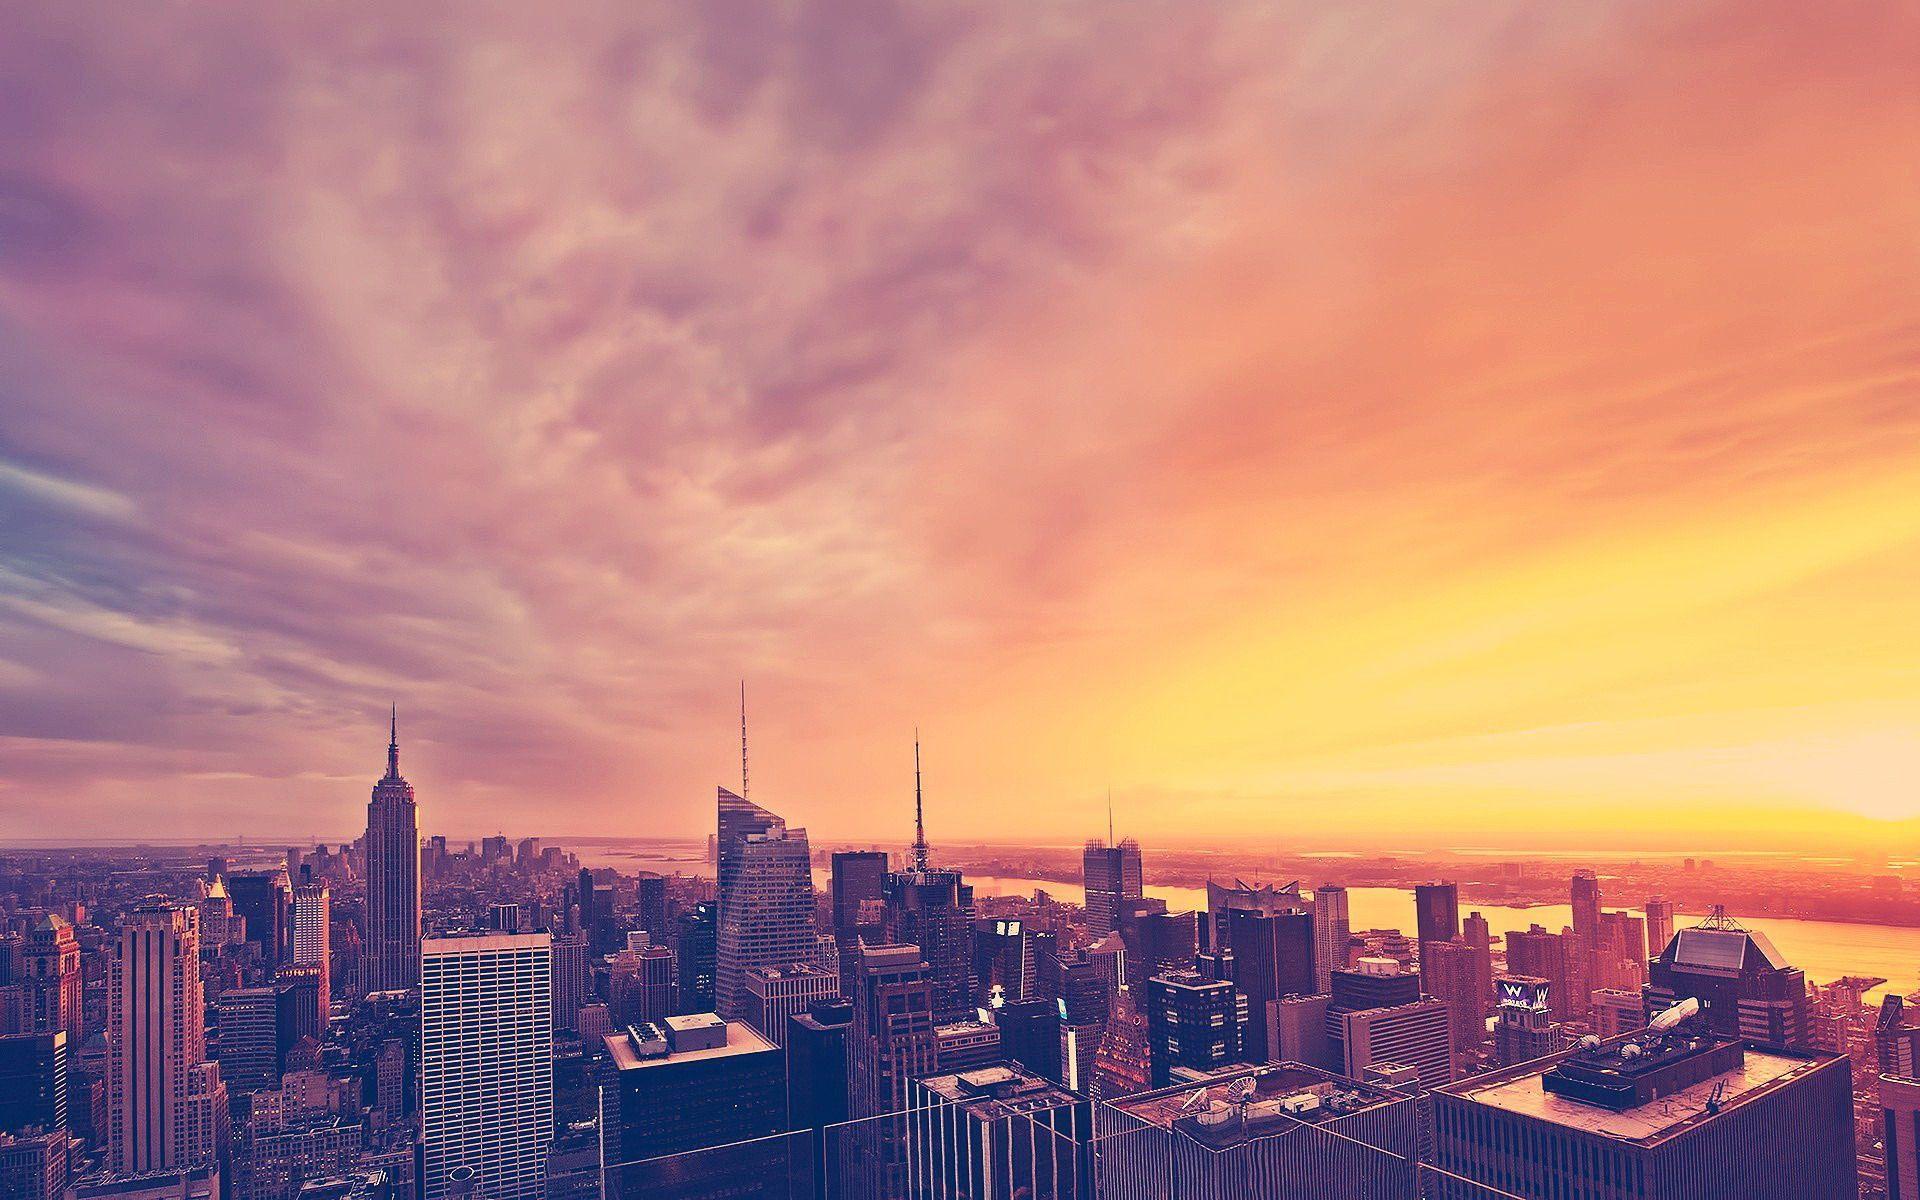 Sunset At New York City Sunset City London City City Wallpaper